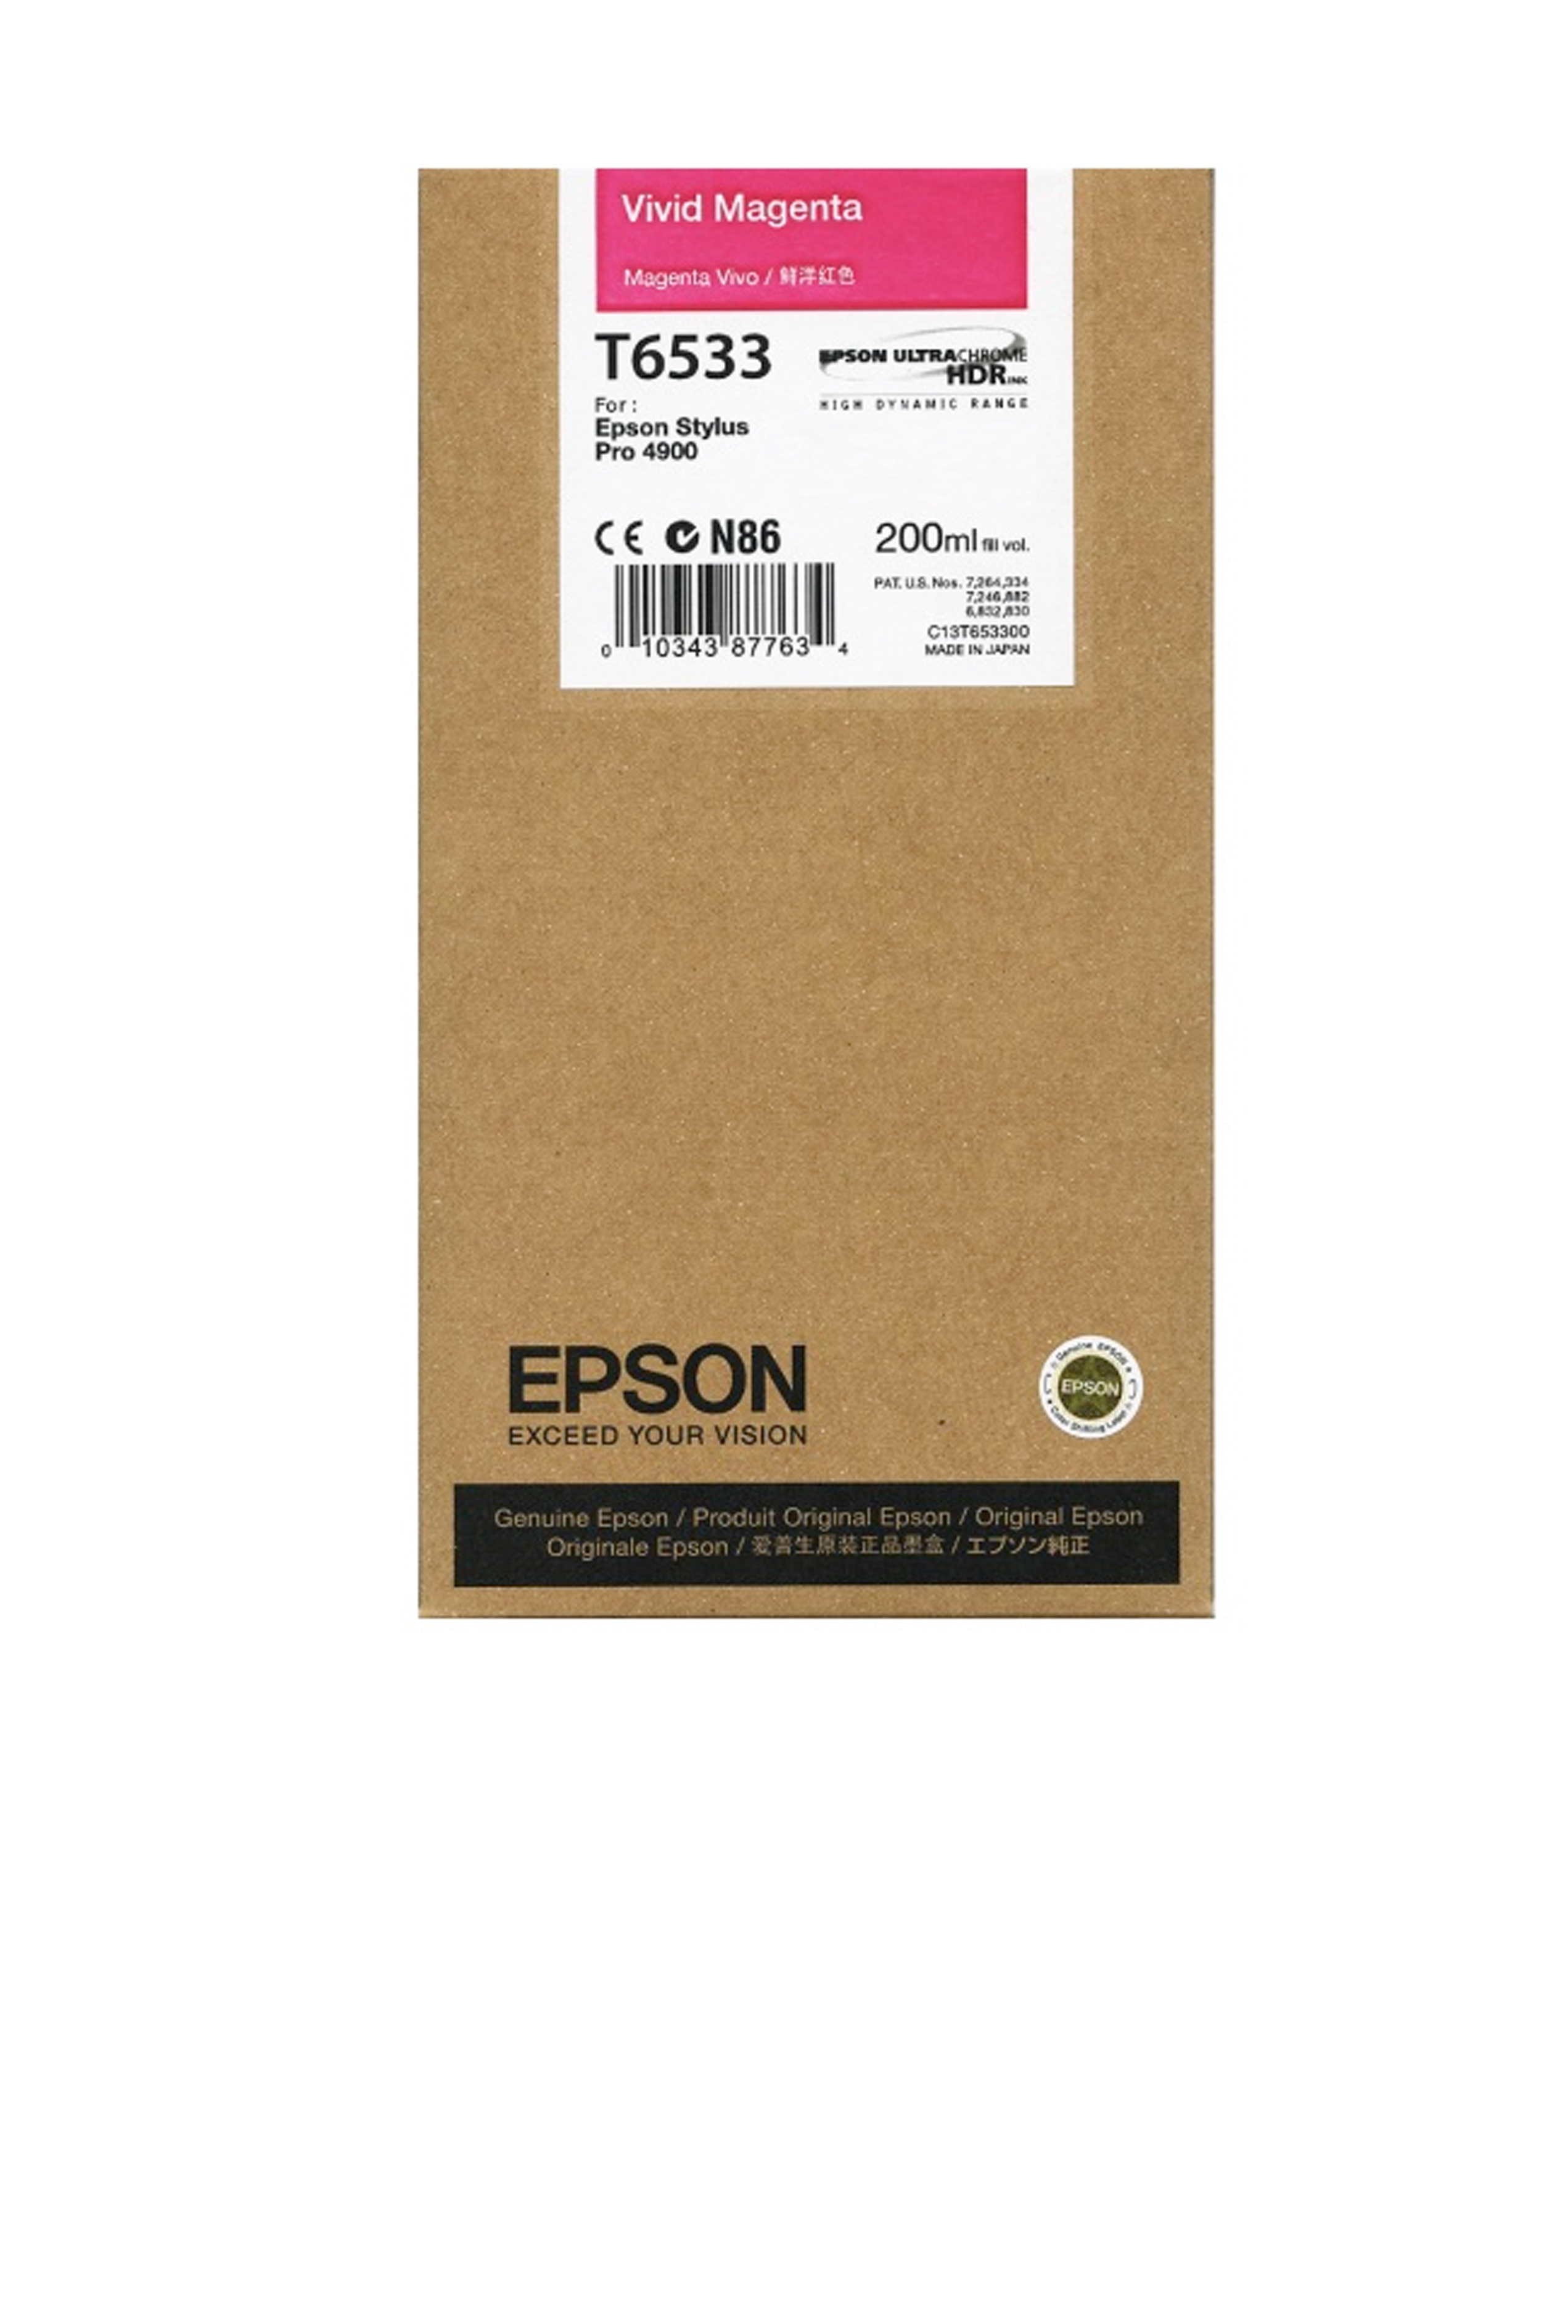 Epson EPSON SD VIVID MAGENTA INK (200 ML) (T653300)